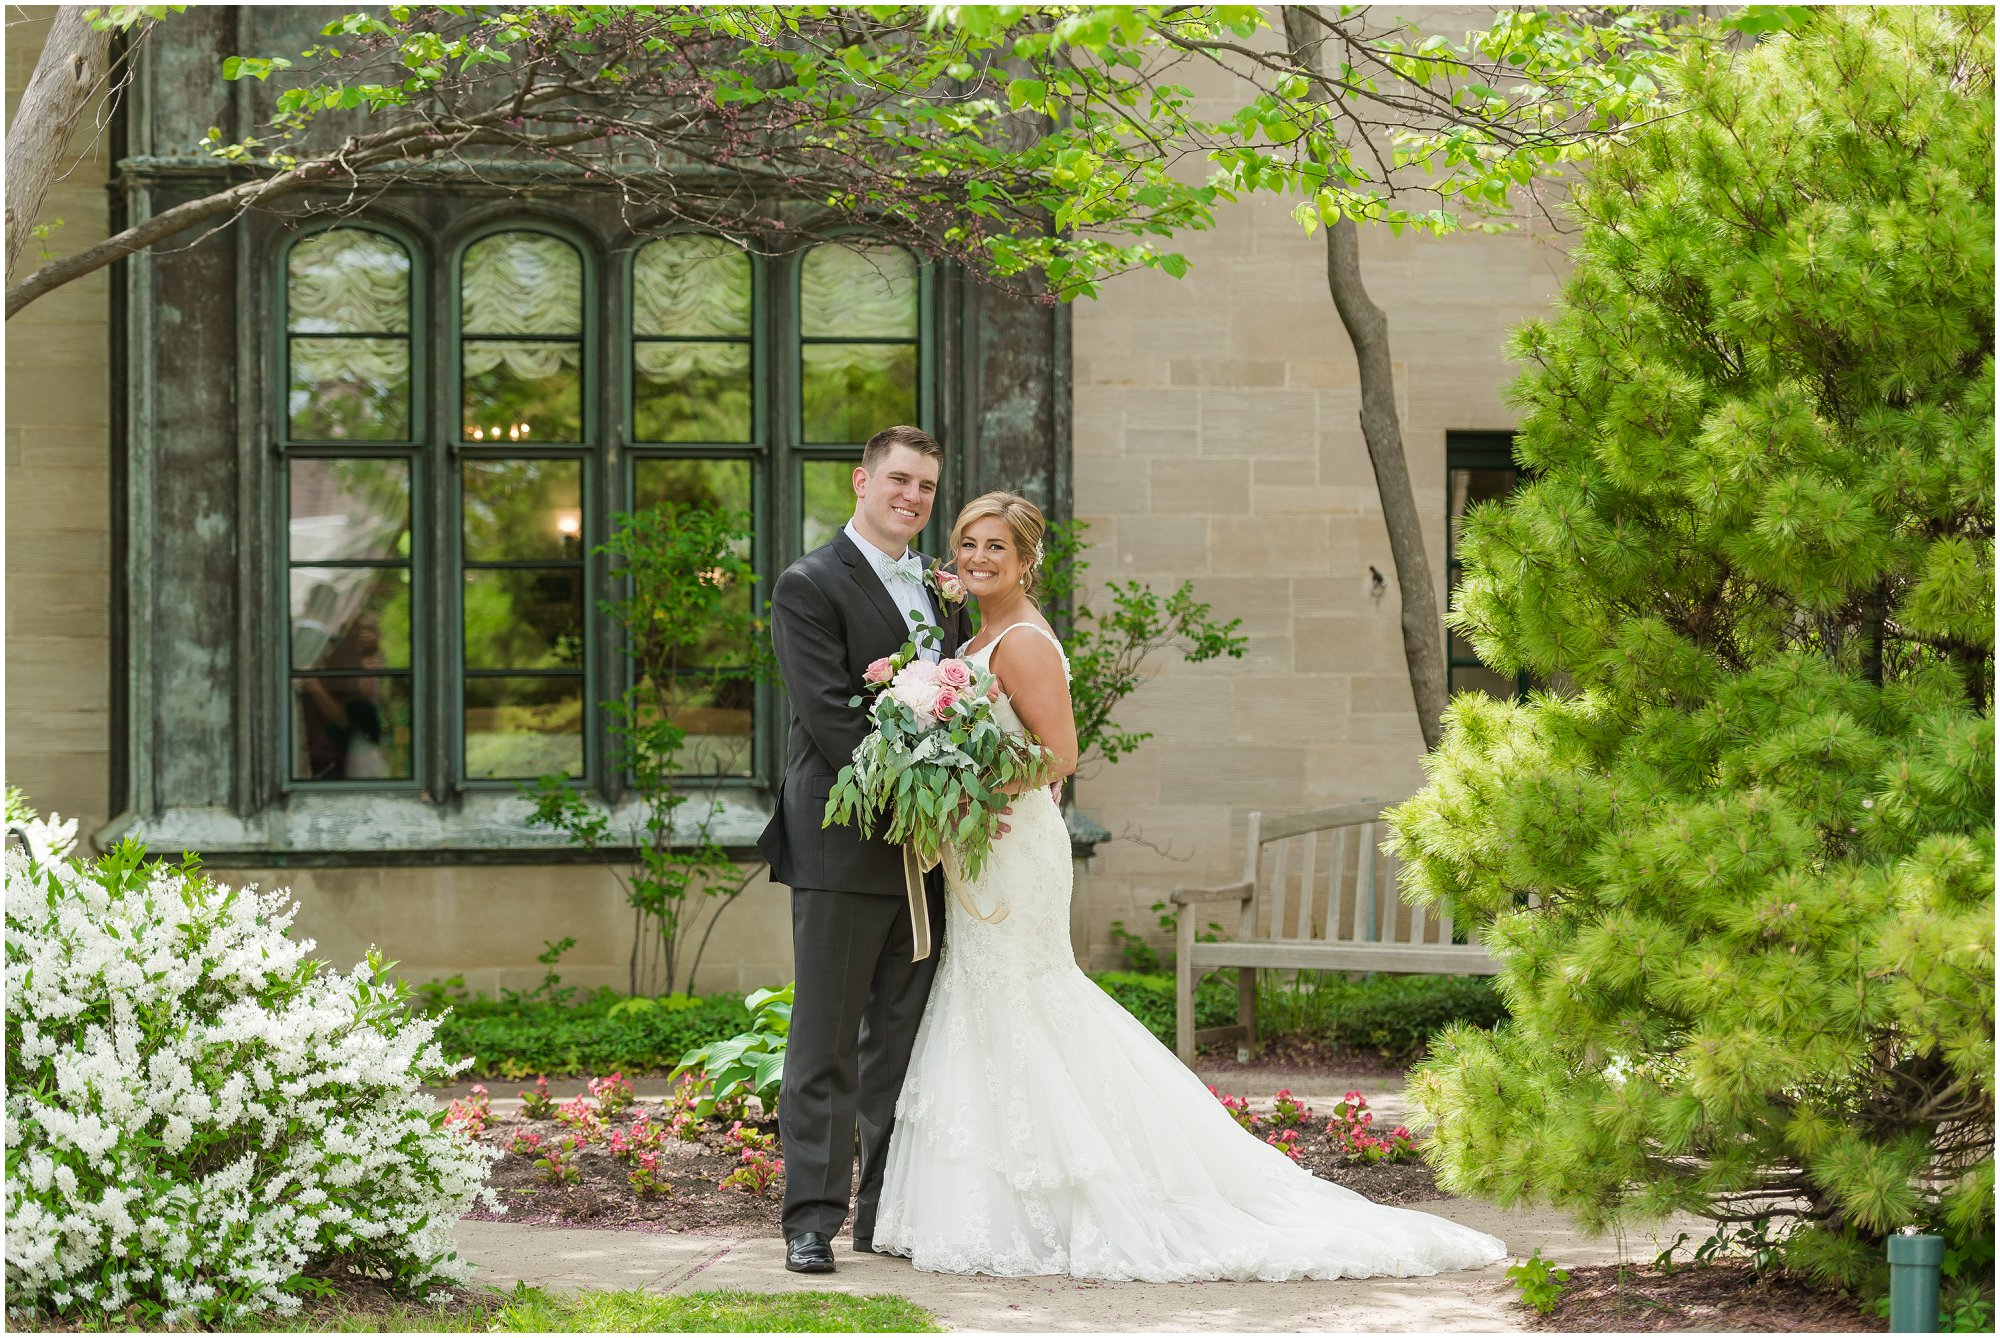 Plymouth_michigan_wedding_photographer_0403.jpg